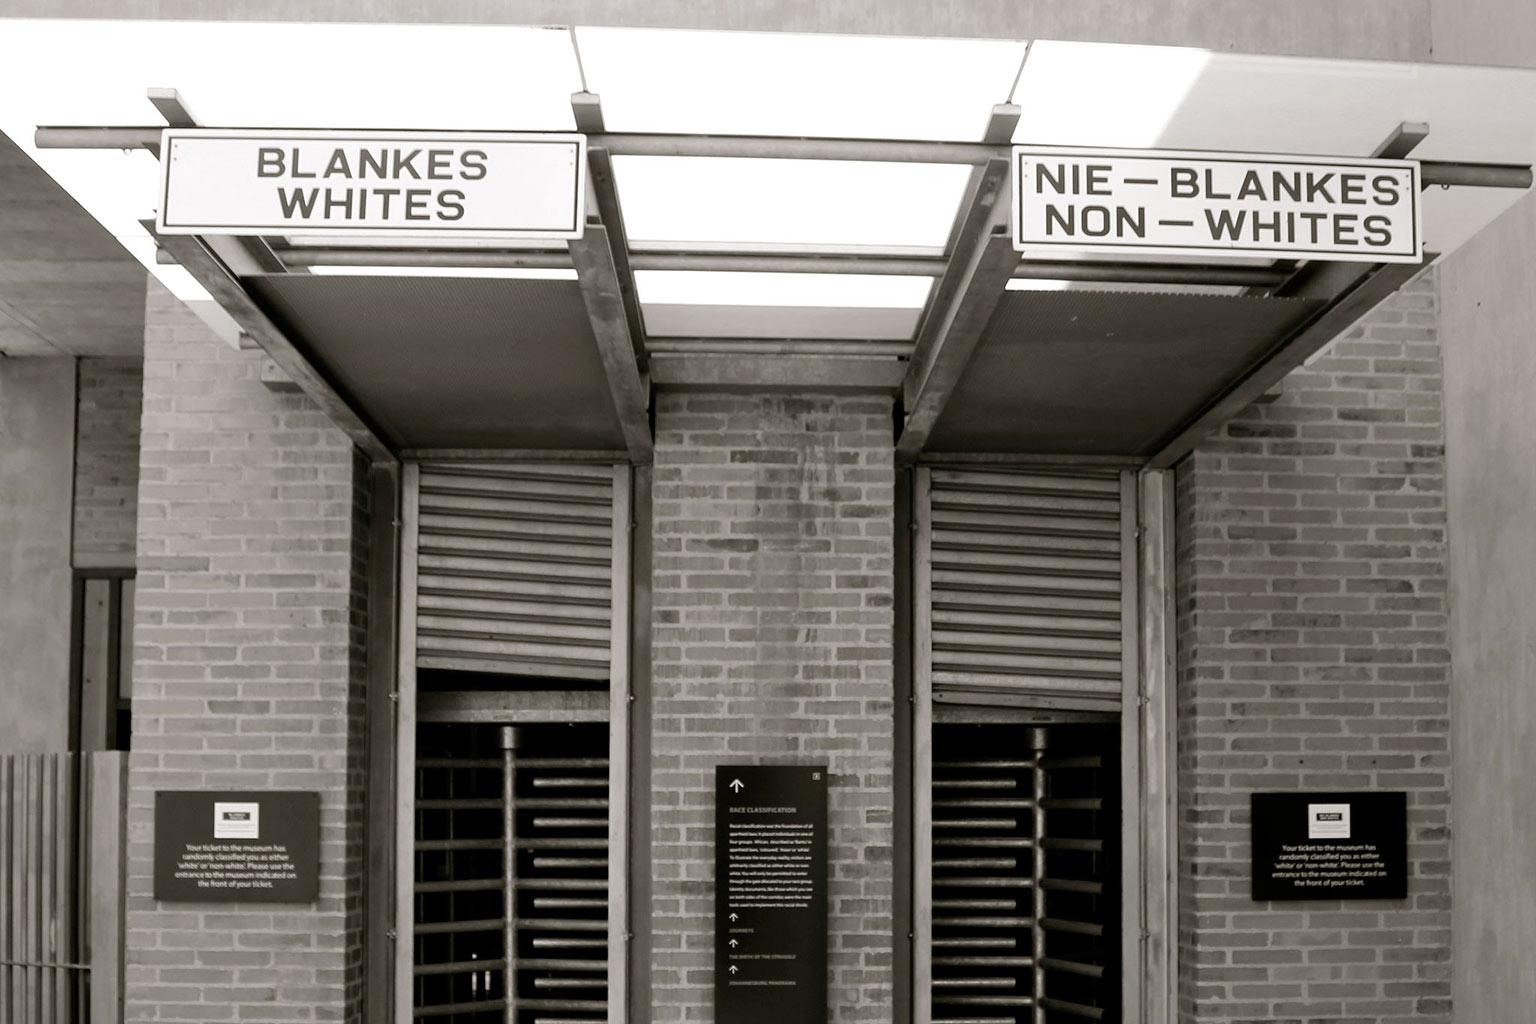 signage for whites vs. non-whites outside building